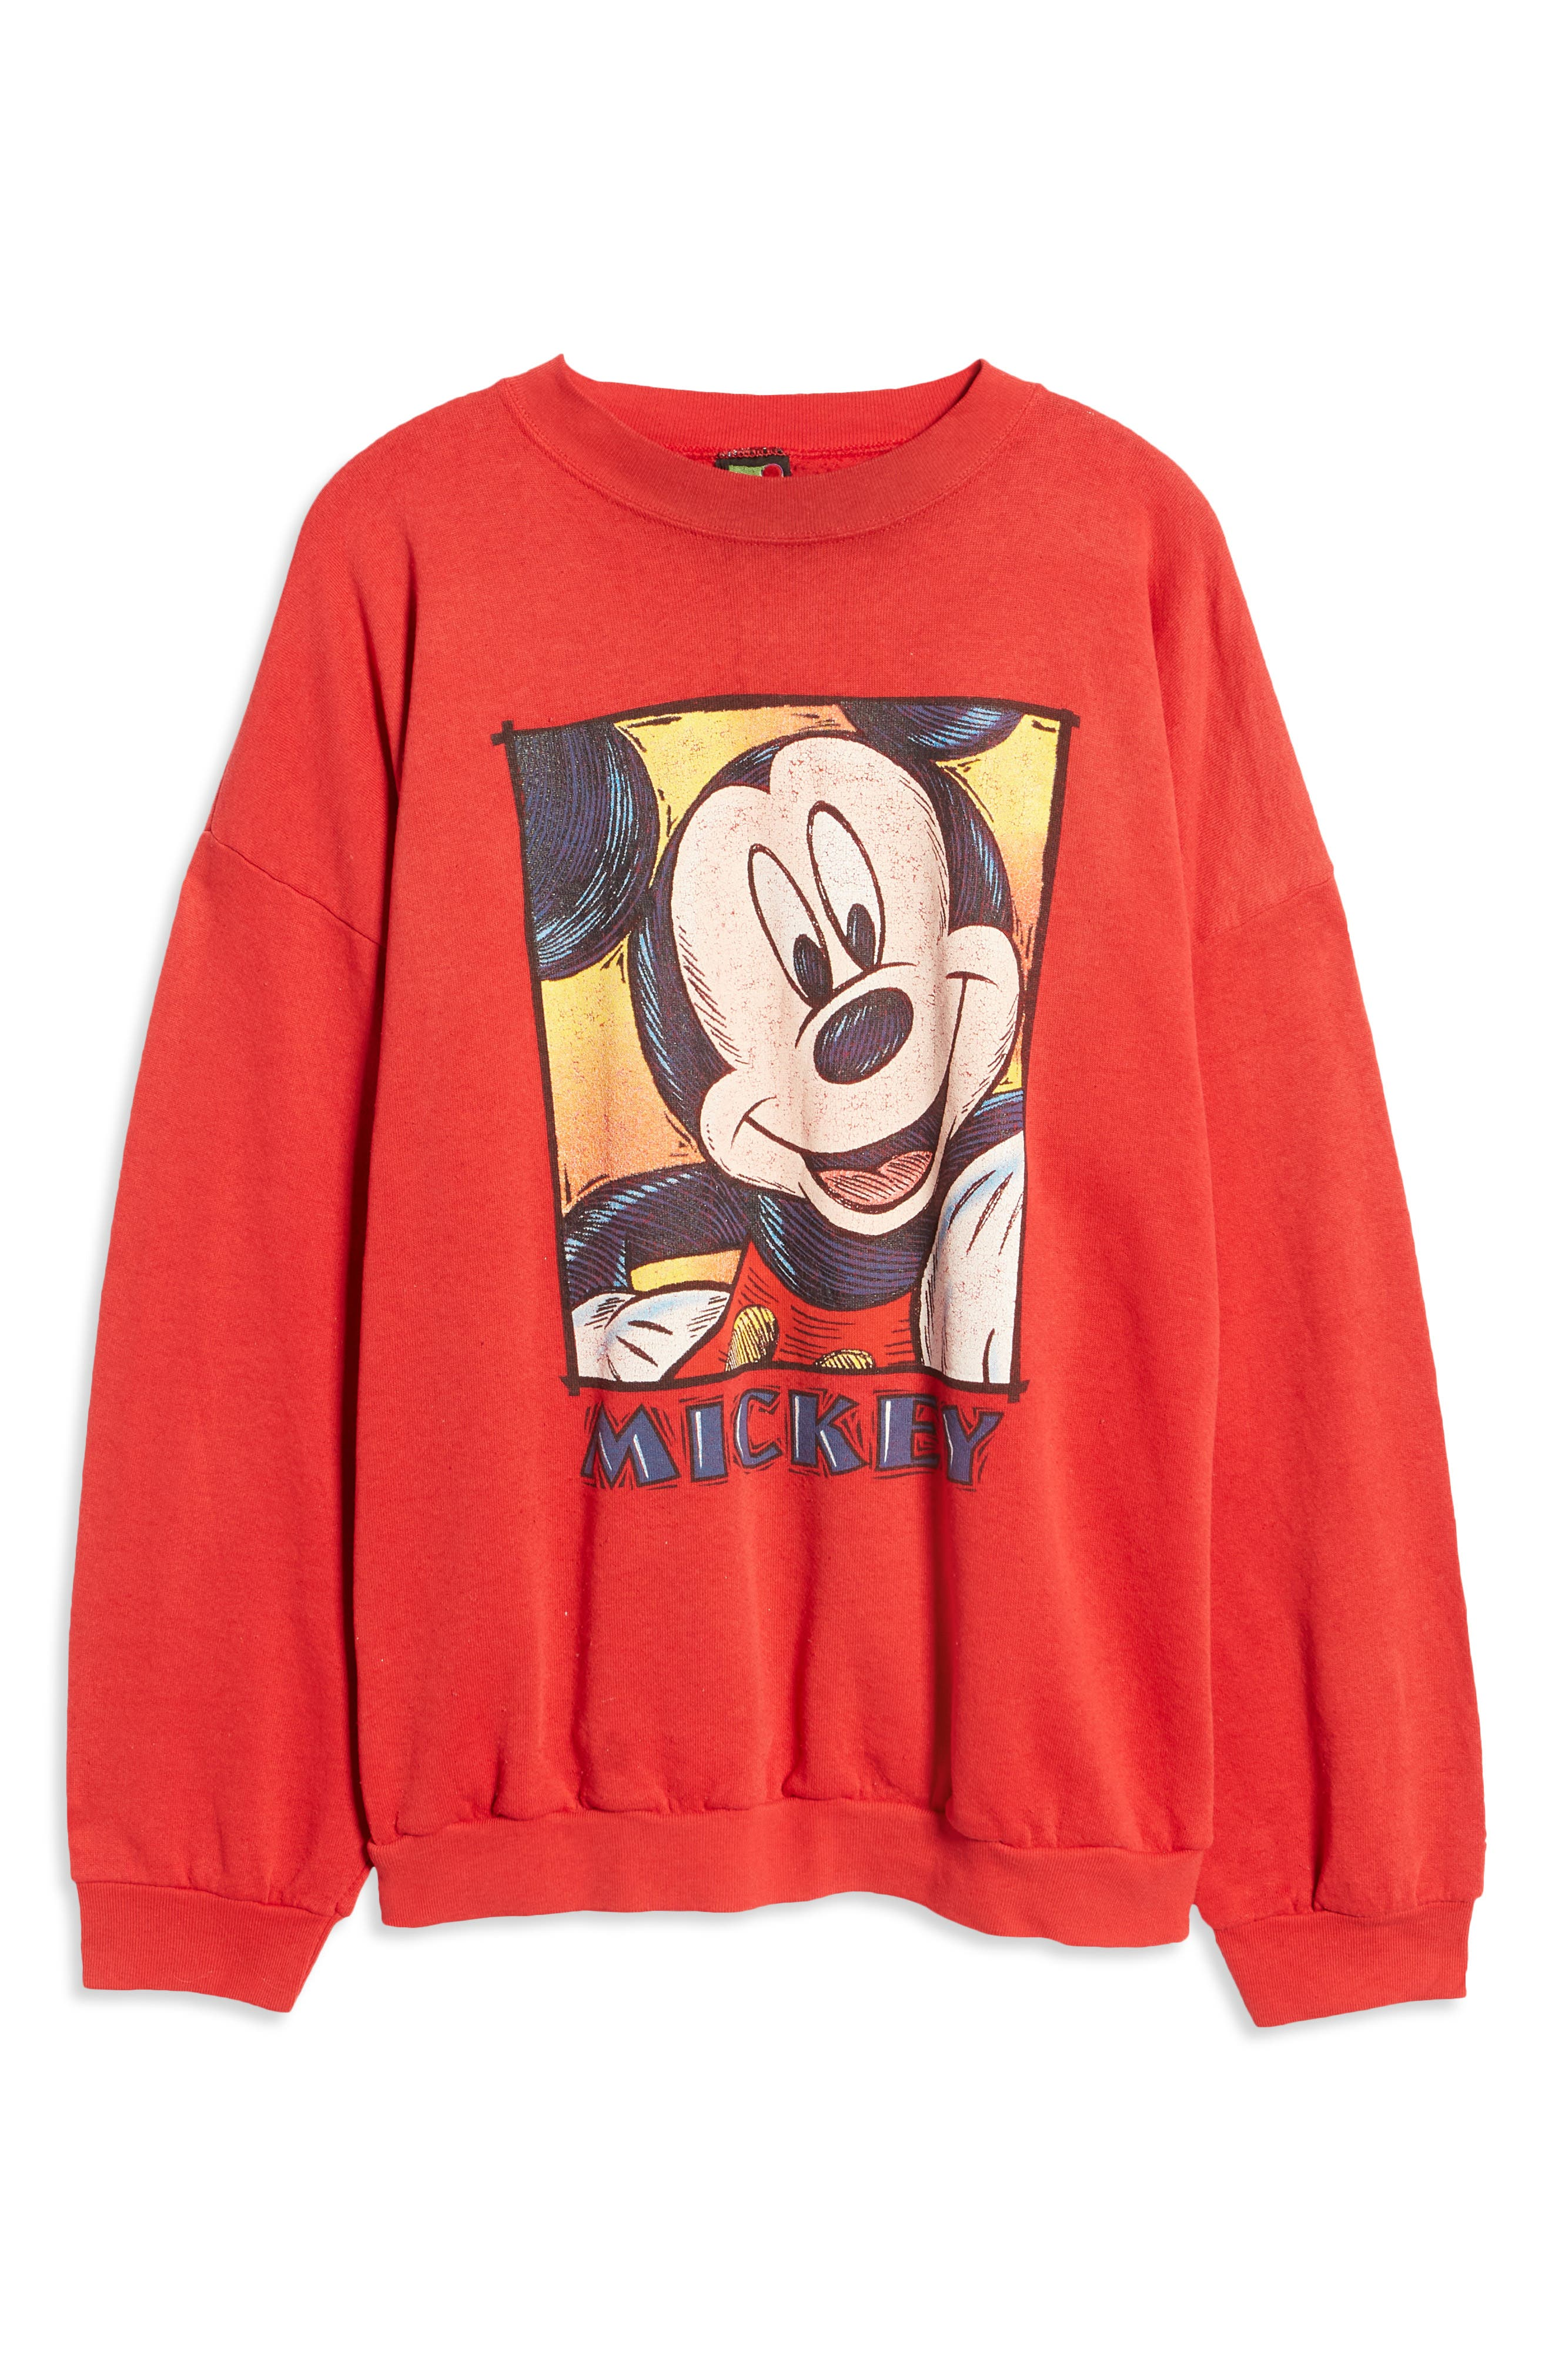 Unisex Secondhand Mickey Graphic Crewneck Sweatshirt